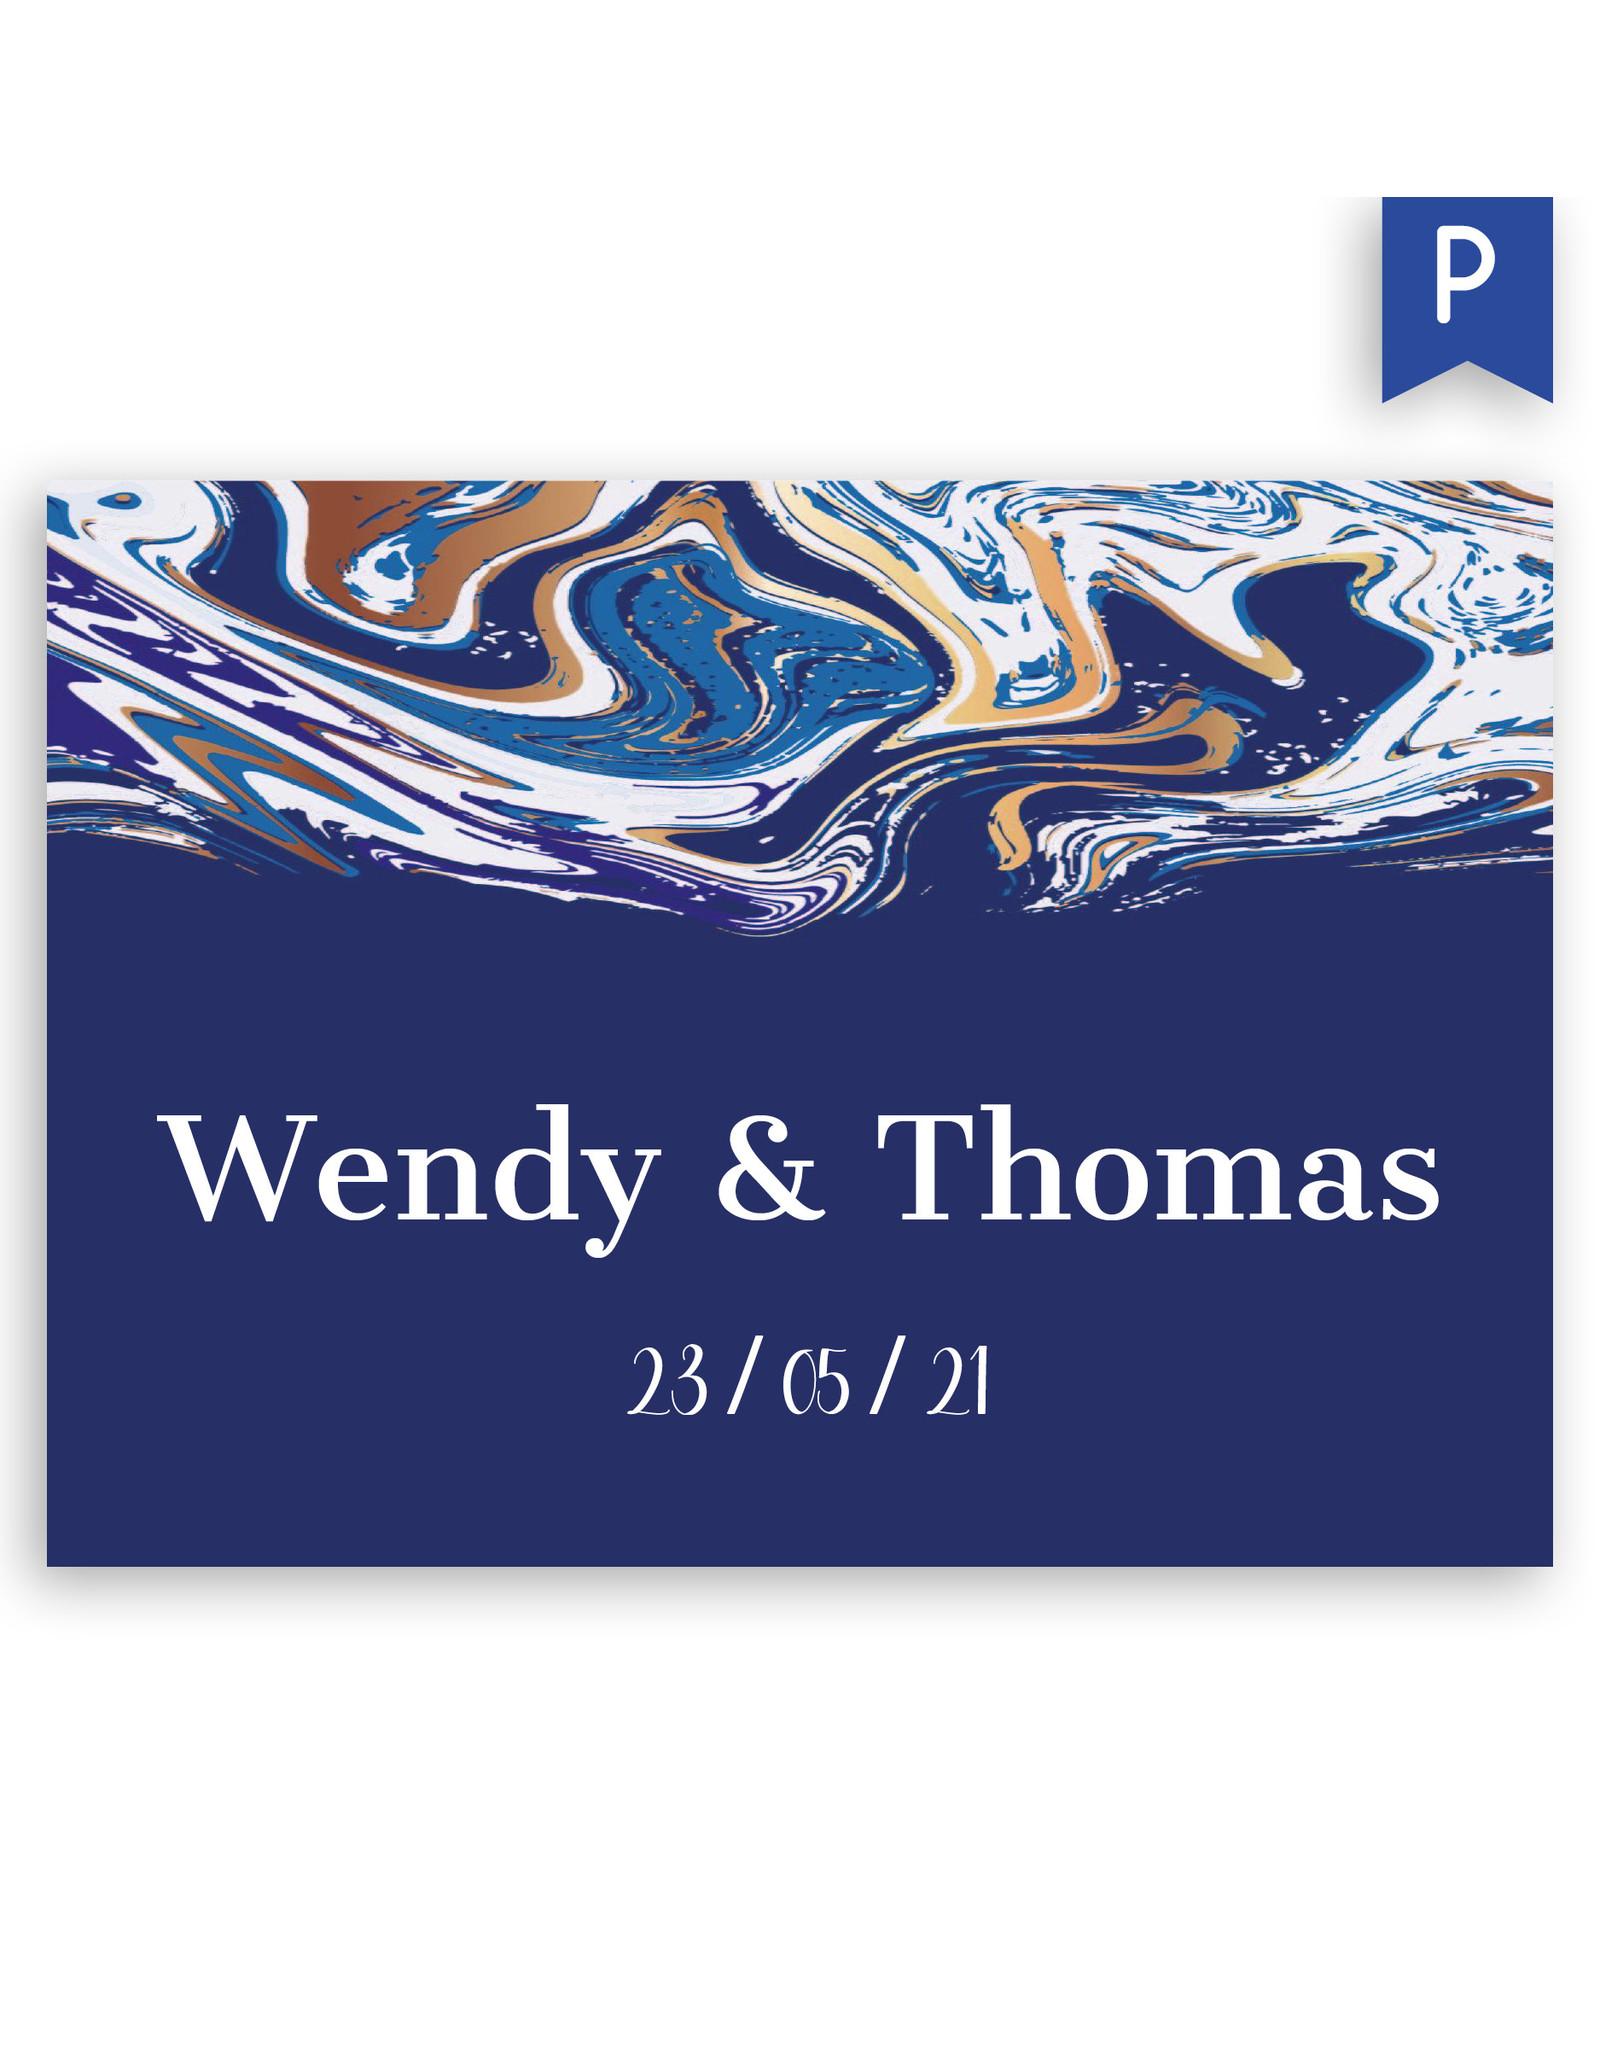 www.Robin.cards Trouwkaarten premium enkel rechthoek Wendy en Thomas